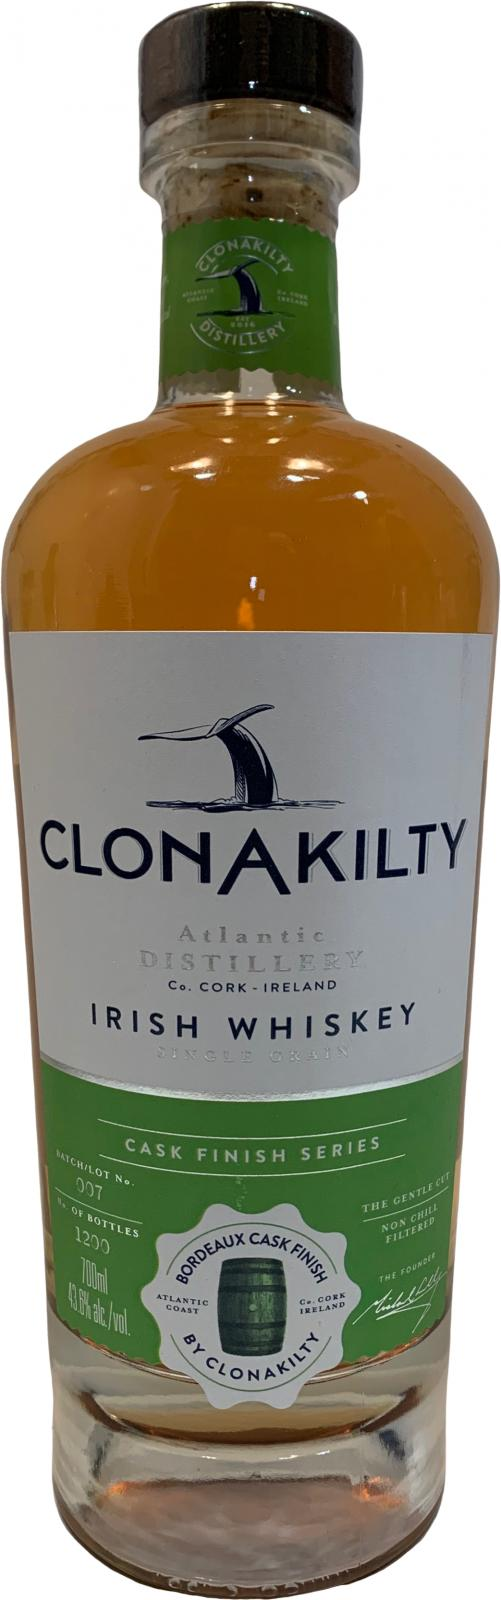 Clonakilty Bordeaux Cask Finish